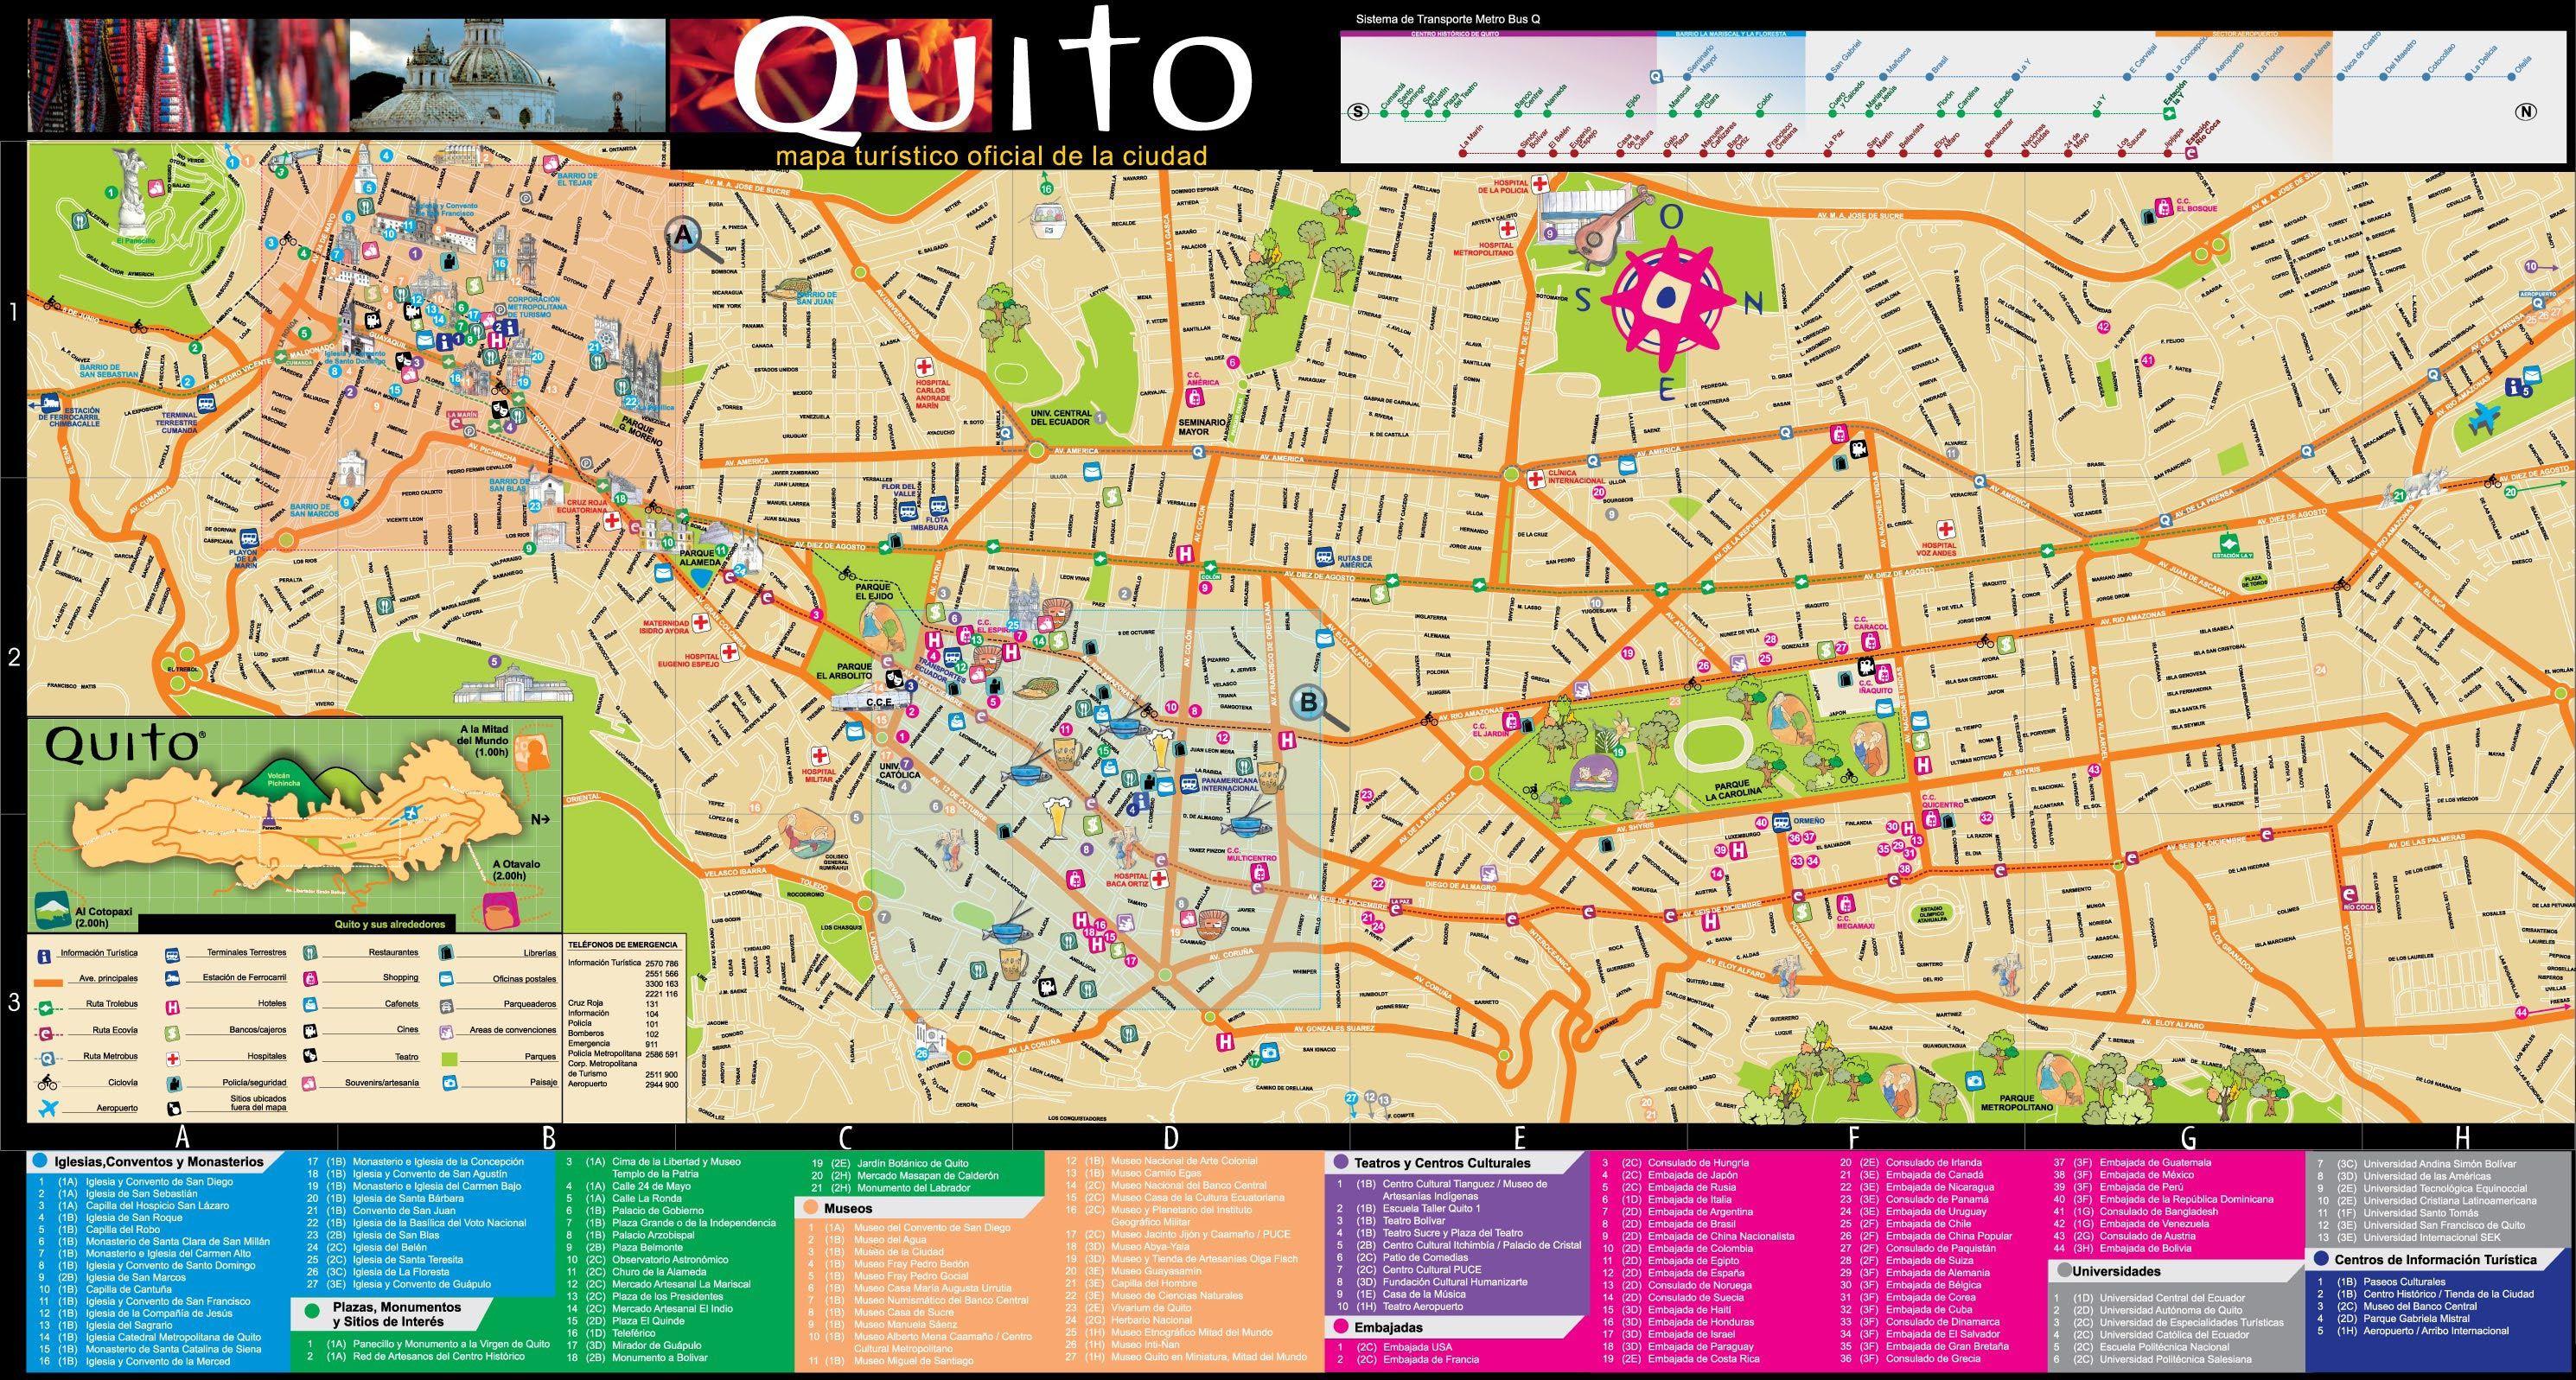 Tourist Map Of Quito Tourist Map Quito Tourist